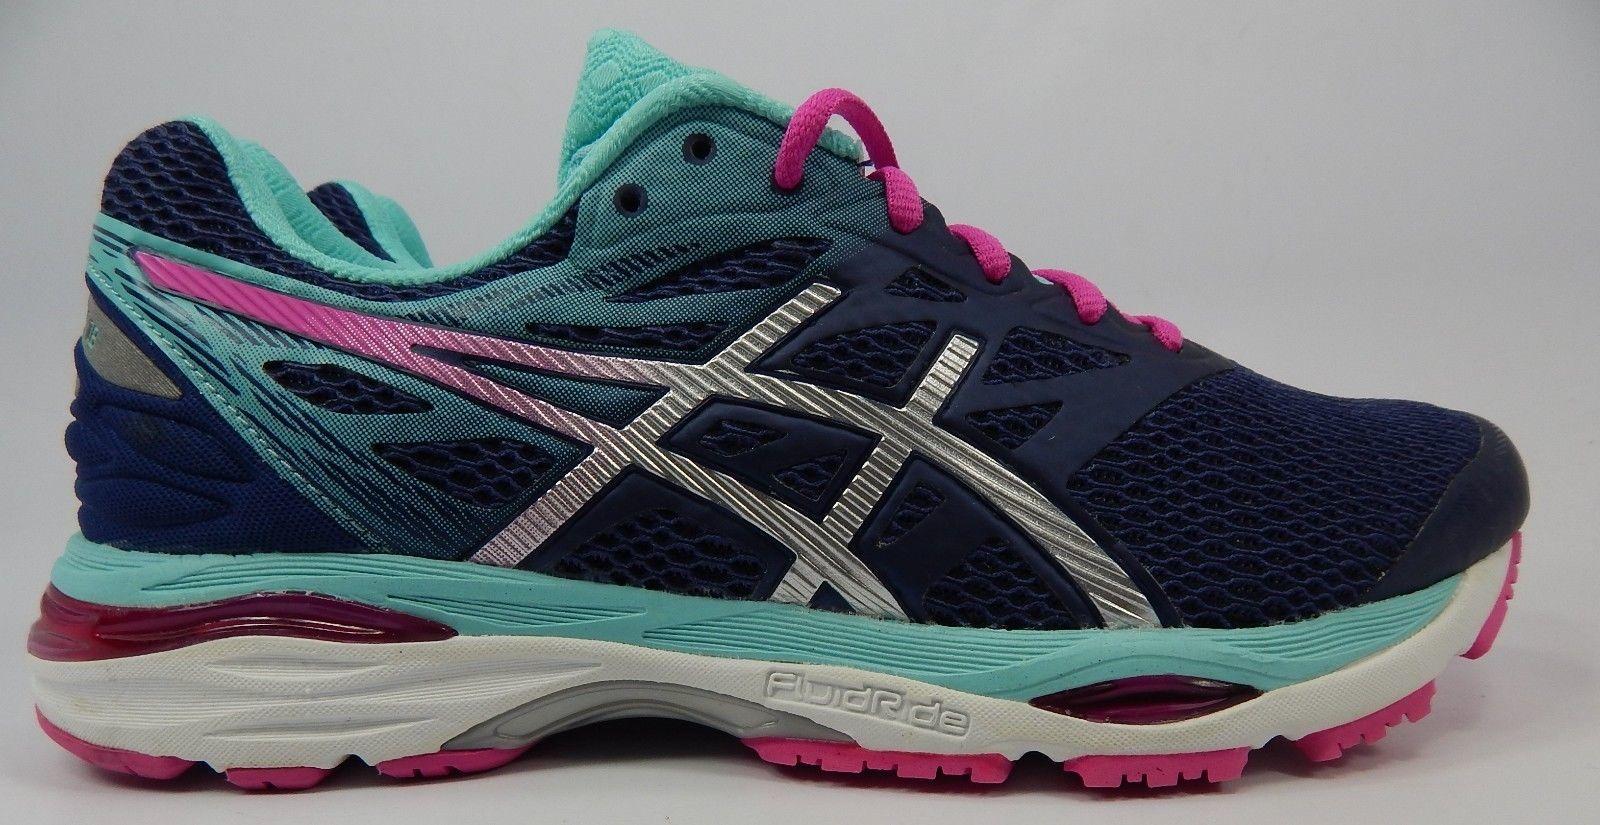 Asics Gel Cumulus 18 Size US 9.5 M (B) EU 41.5 Women's Running Shoes Blue T6C8N